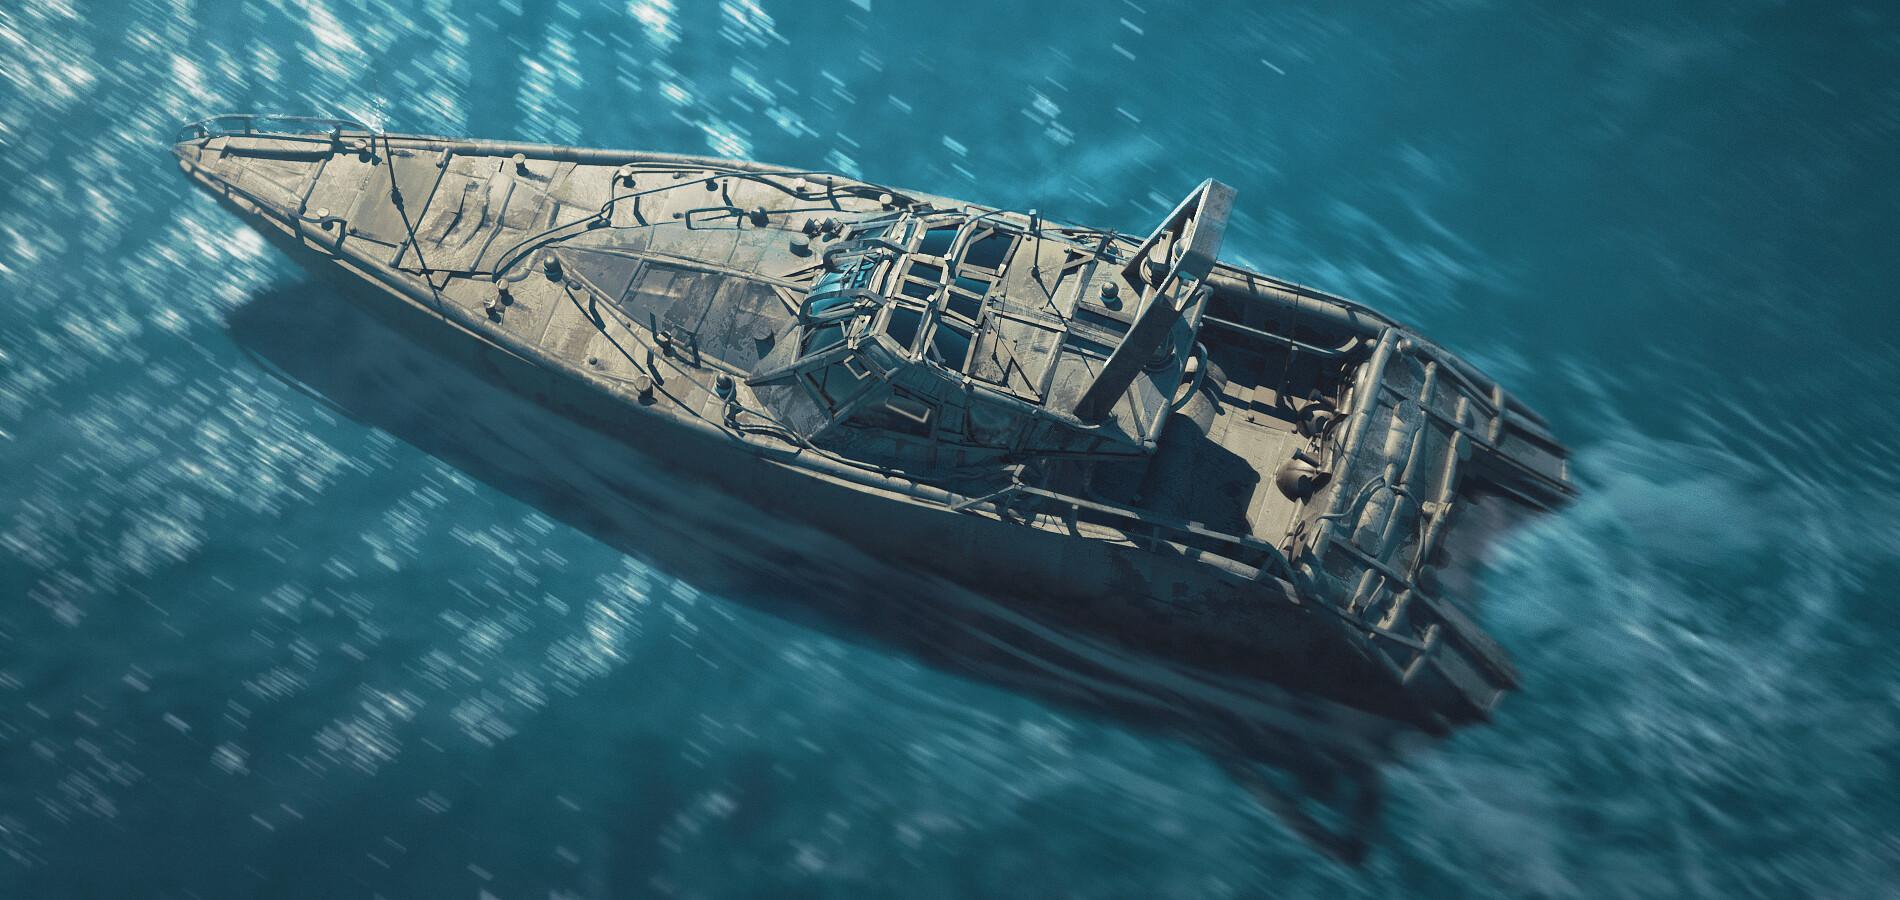 Rene aigner boat03